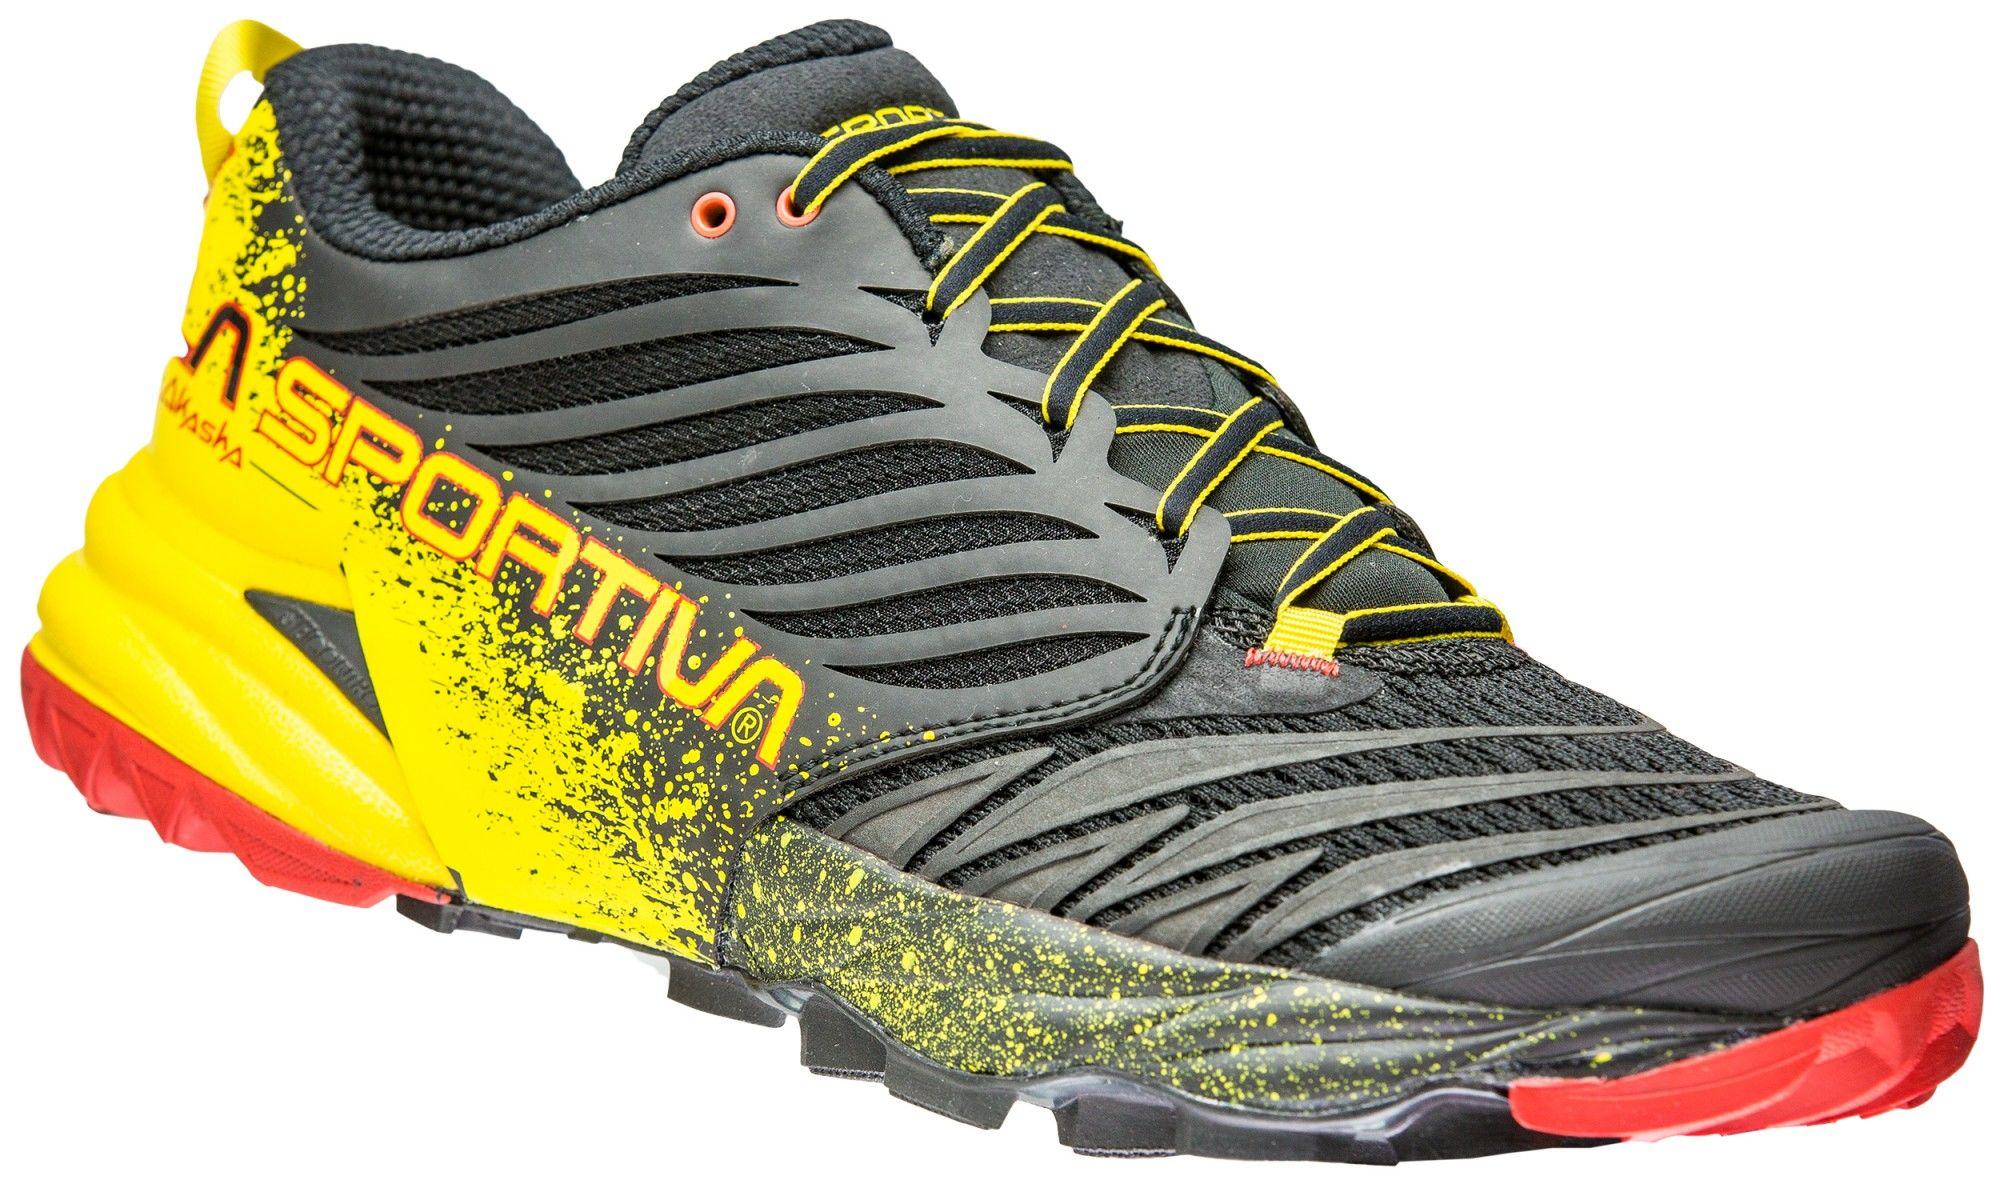 La Sportiva Akasha Gelb, Male EU 43.5 -Farbe Black -Yellow, 43.5